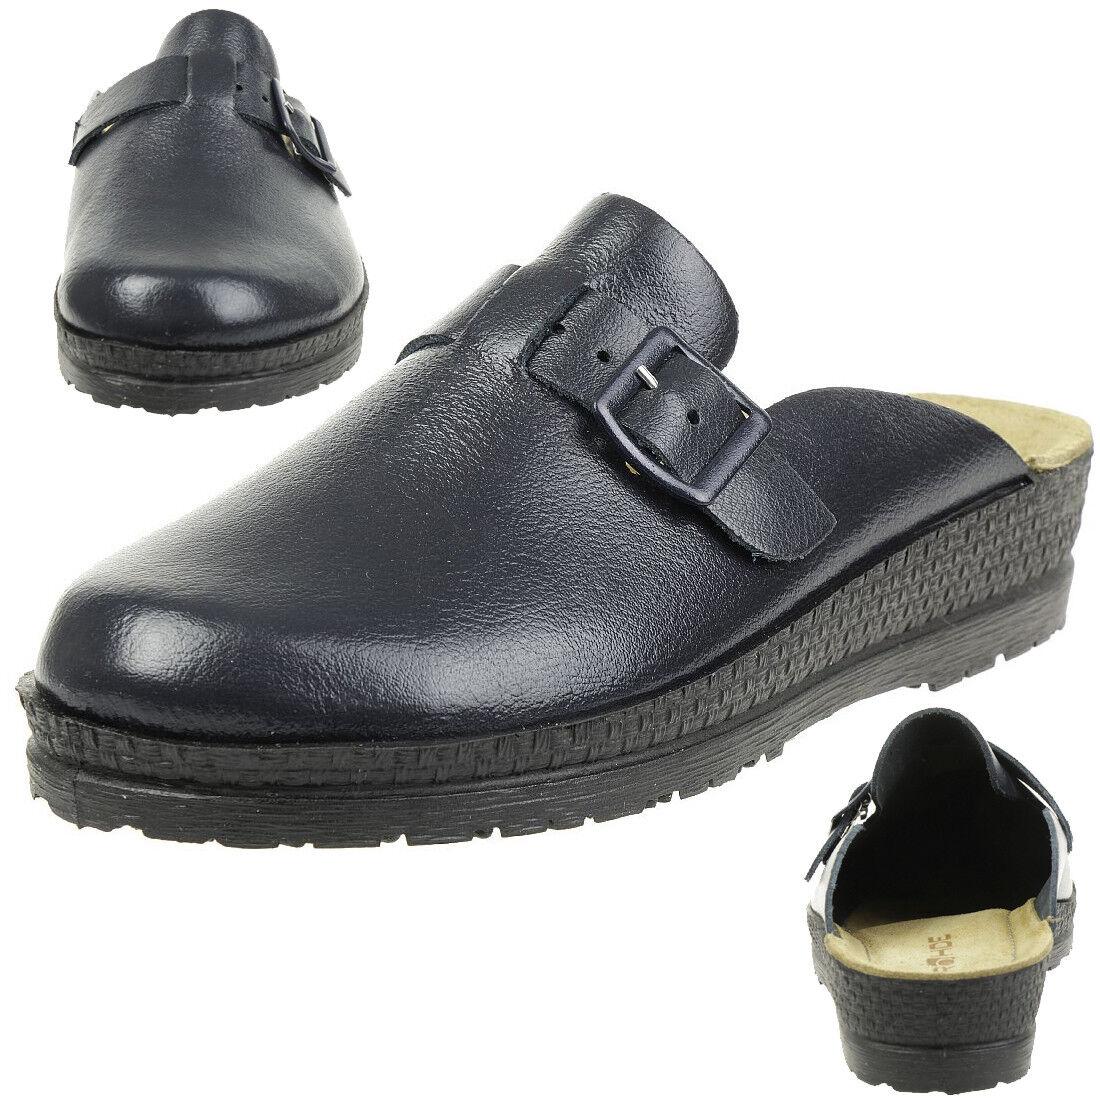 Rohde Neustadt Neustadt Neustadt D Zuecos Zapatillas de Estar por Casa de Mujer Zapatos 1447 Azul  encuentra tu favorito aquí